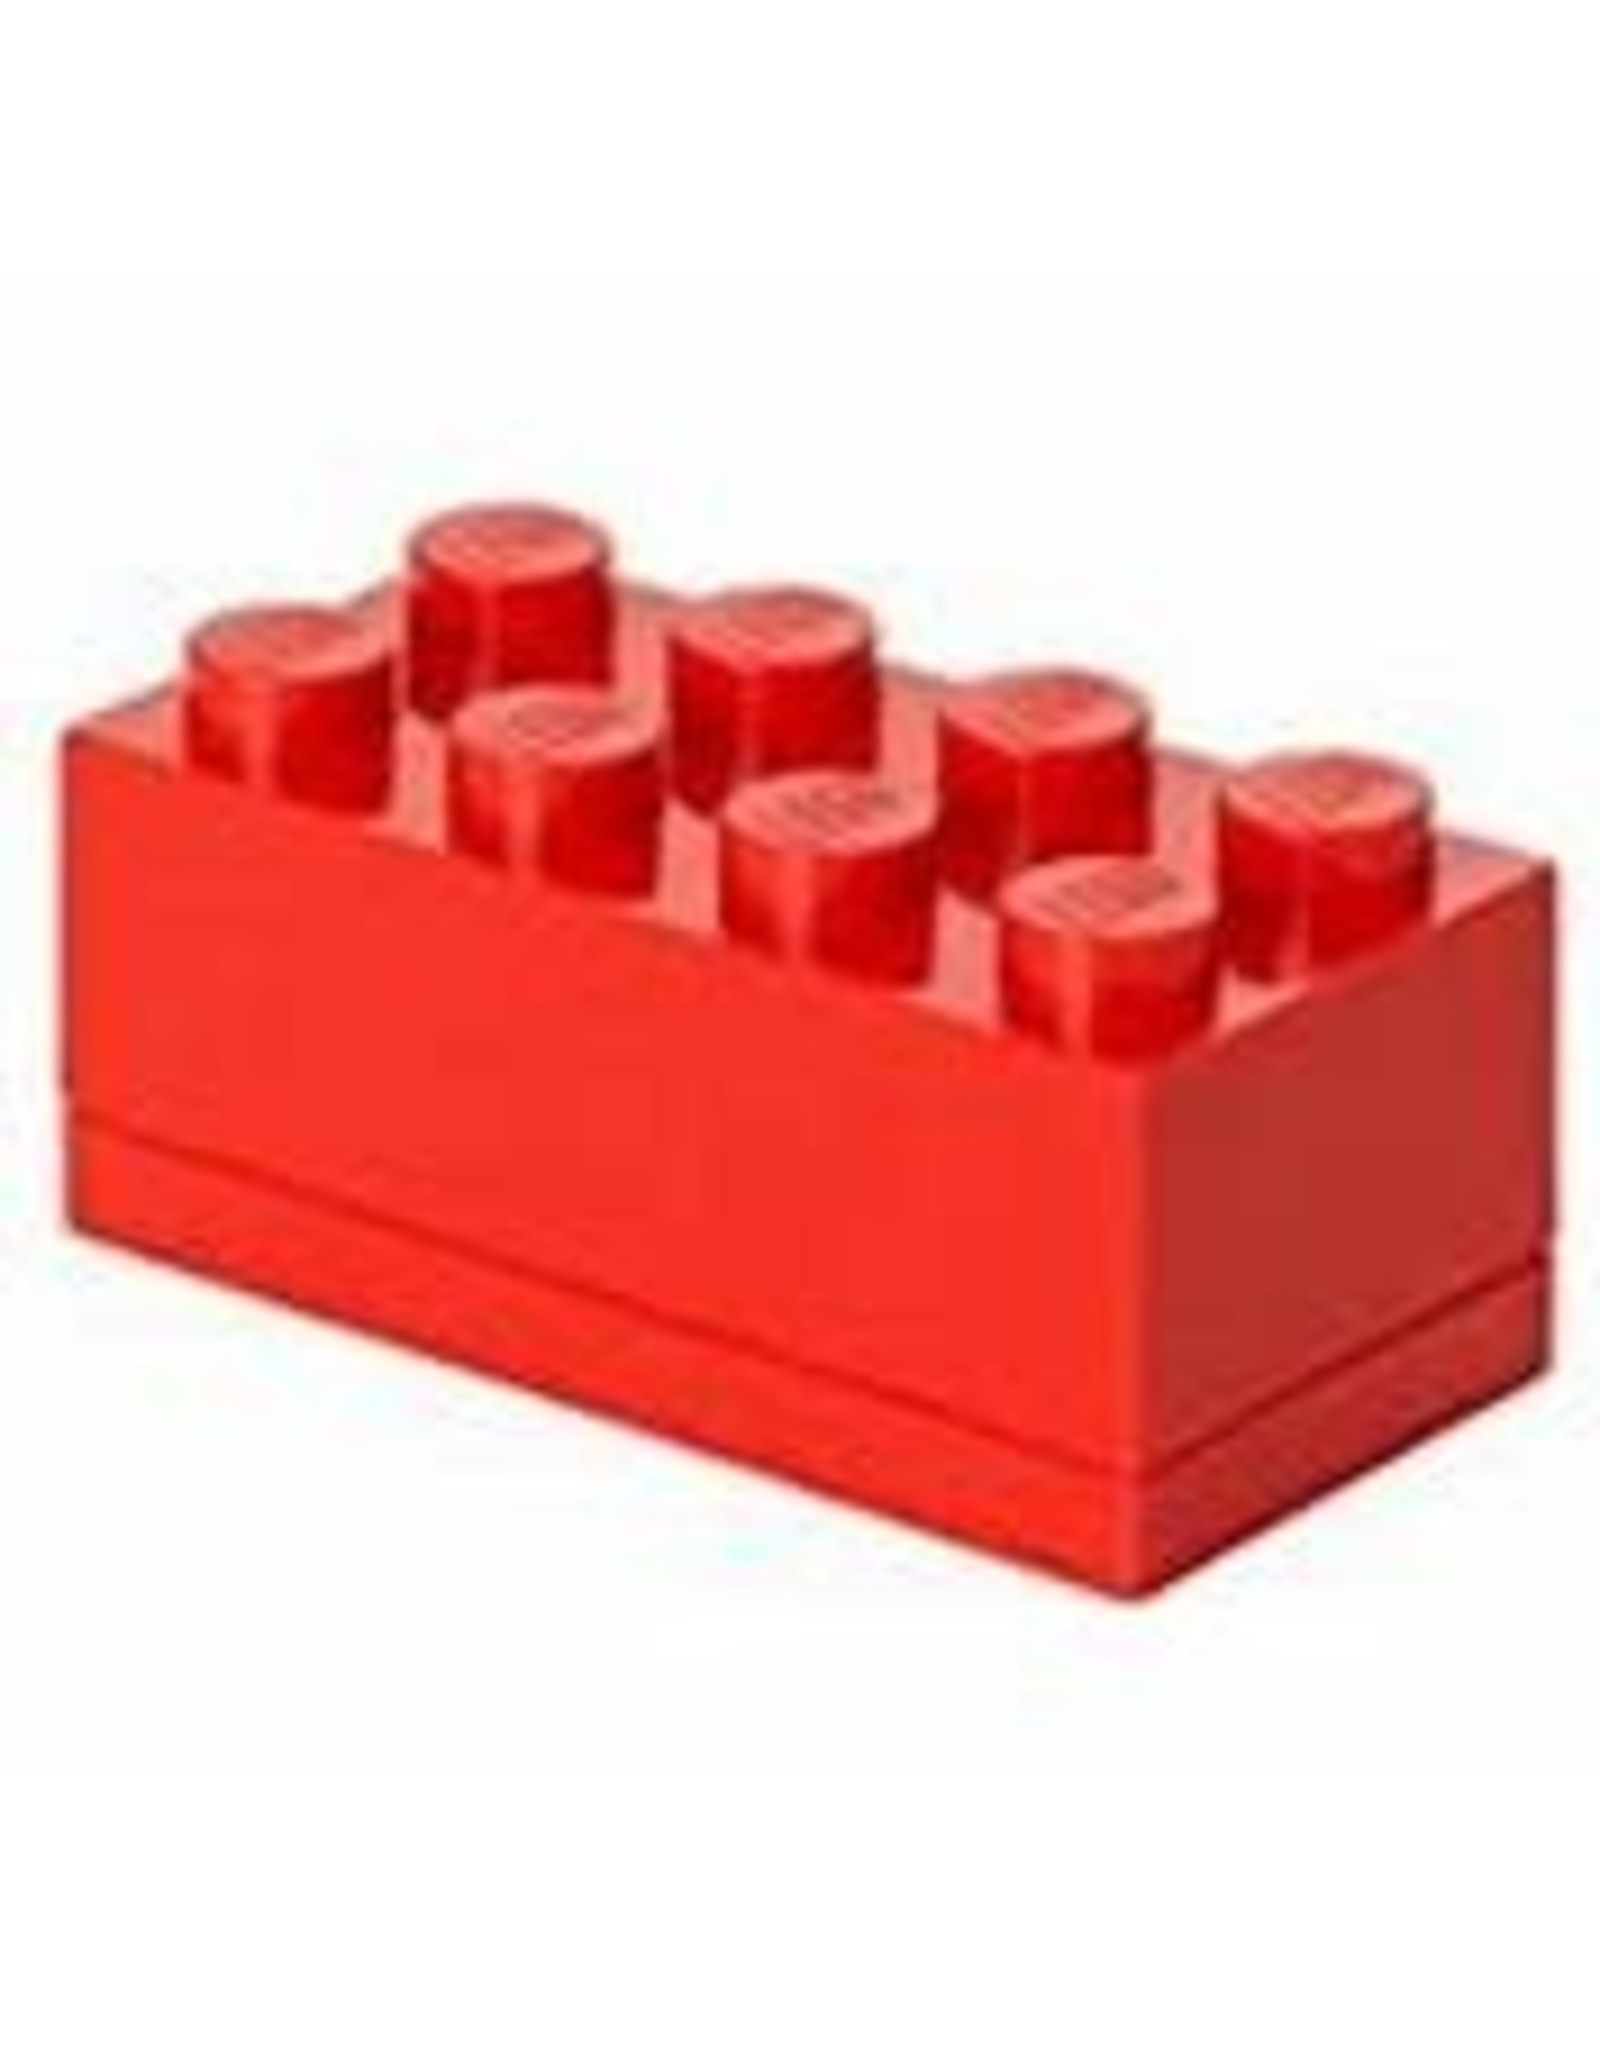 LEGO LEGO MINI BOX 8 - Red